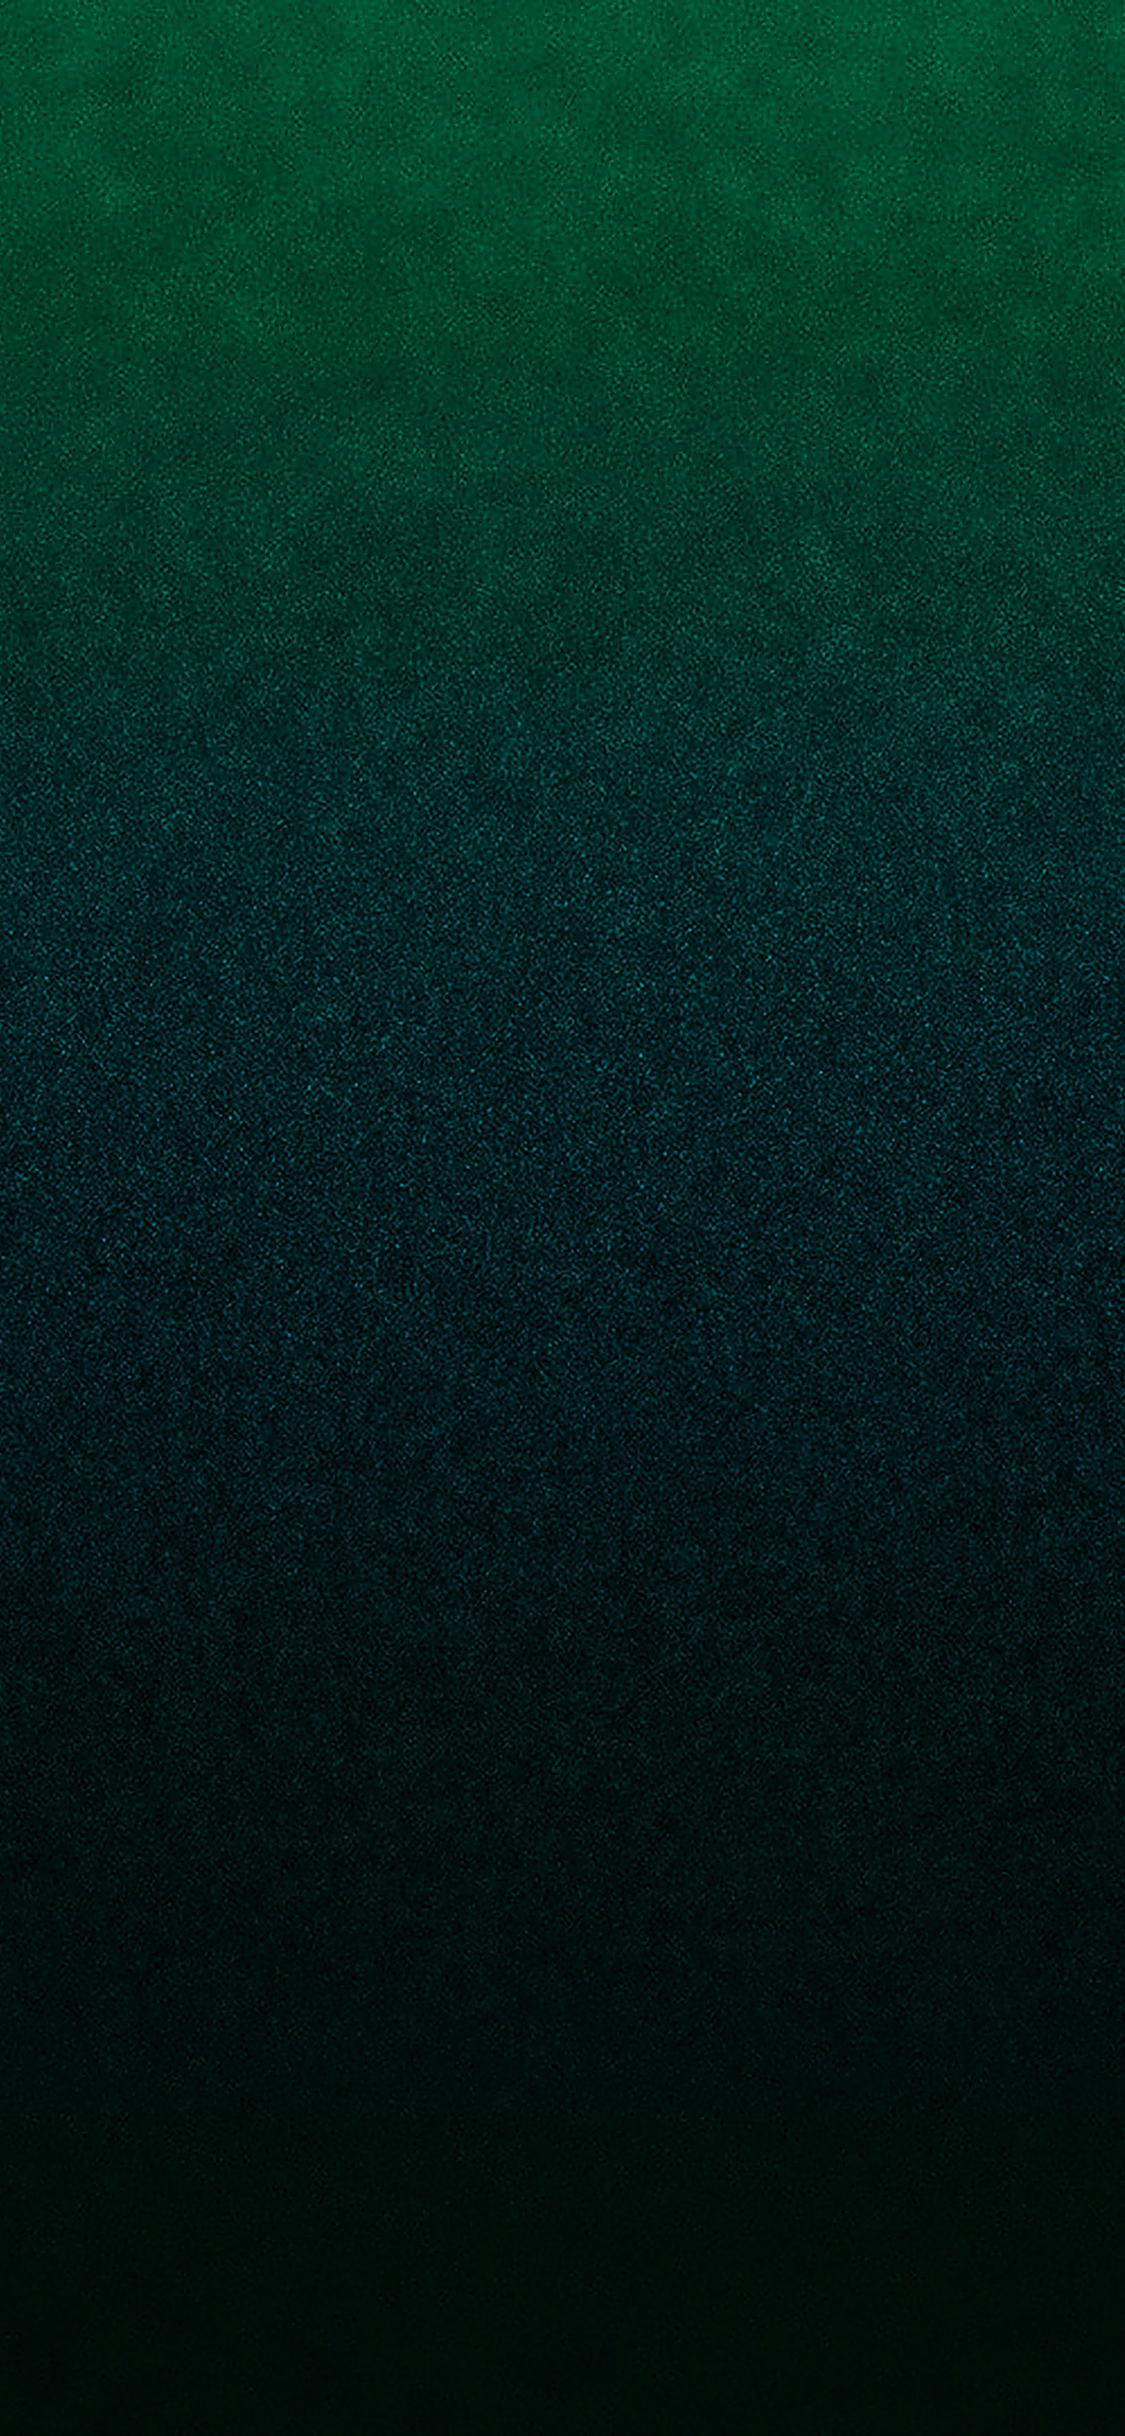 iPhoneXpapers.com-Apple-iPhone-wallpaper-vb52-wallpaper-green-wednesday-pattern